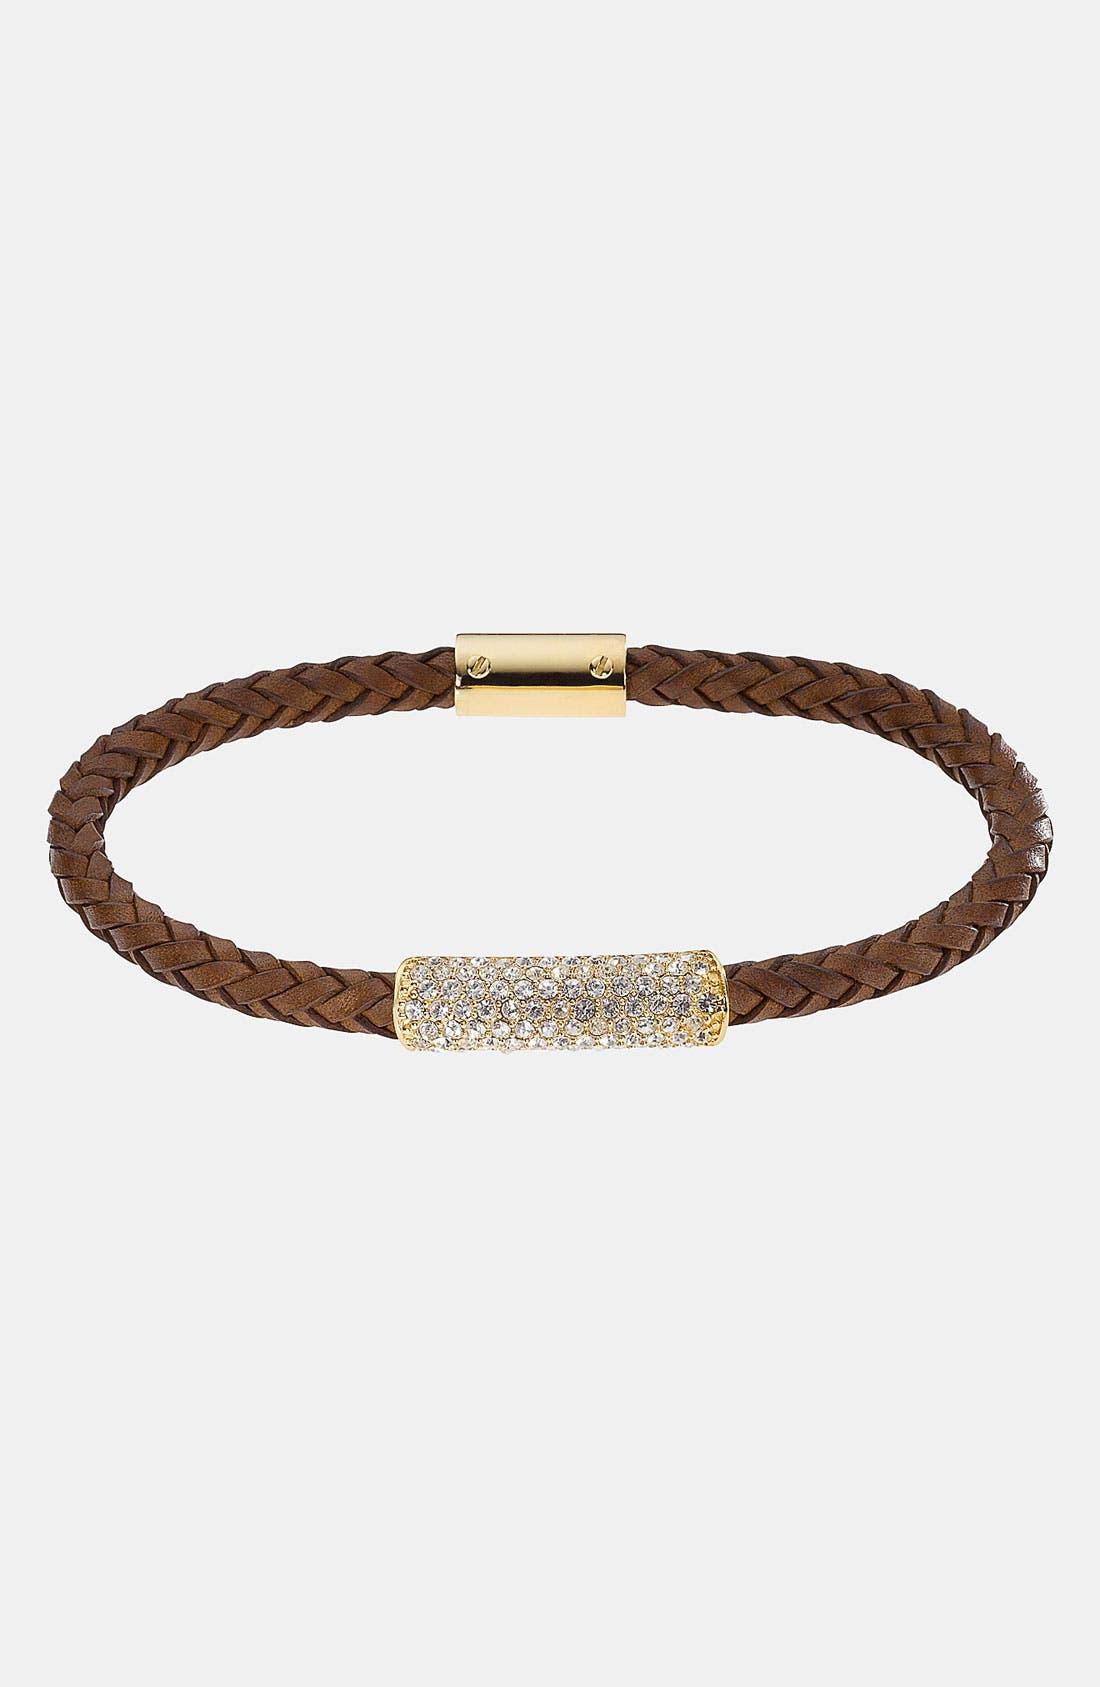 Main Image - Michael Kors 'Skorpios' Skinny Leather Rope Bracelet